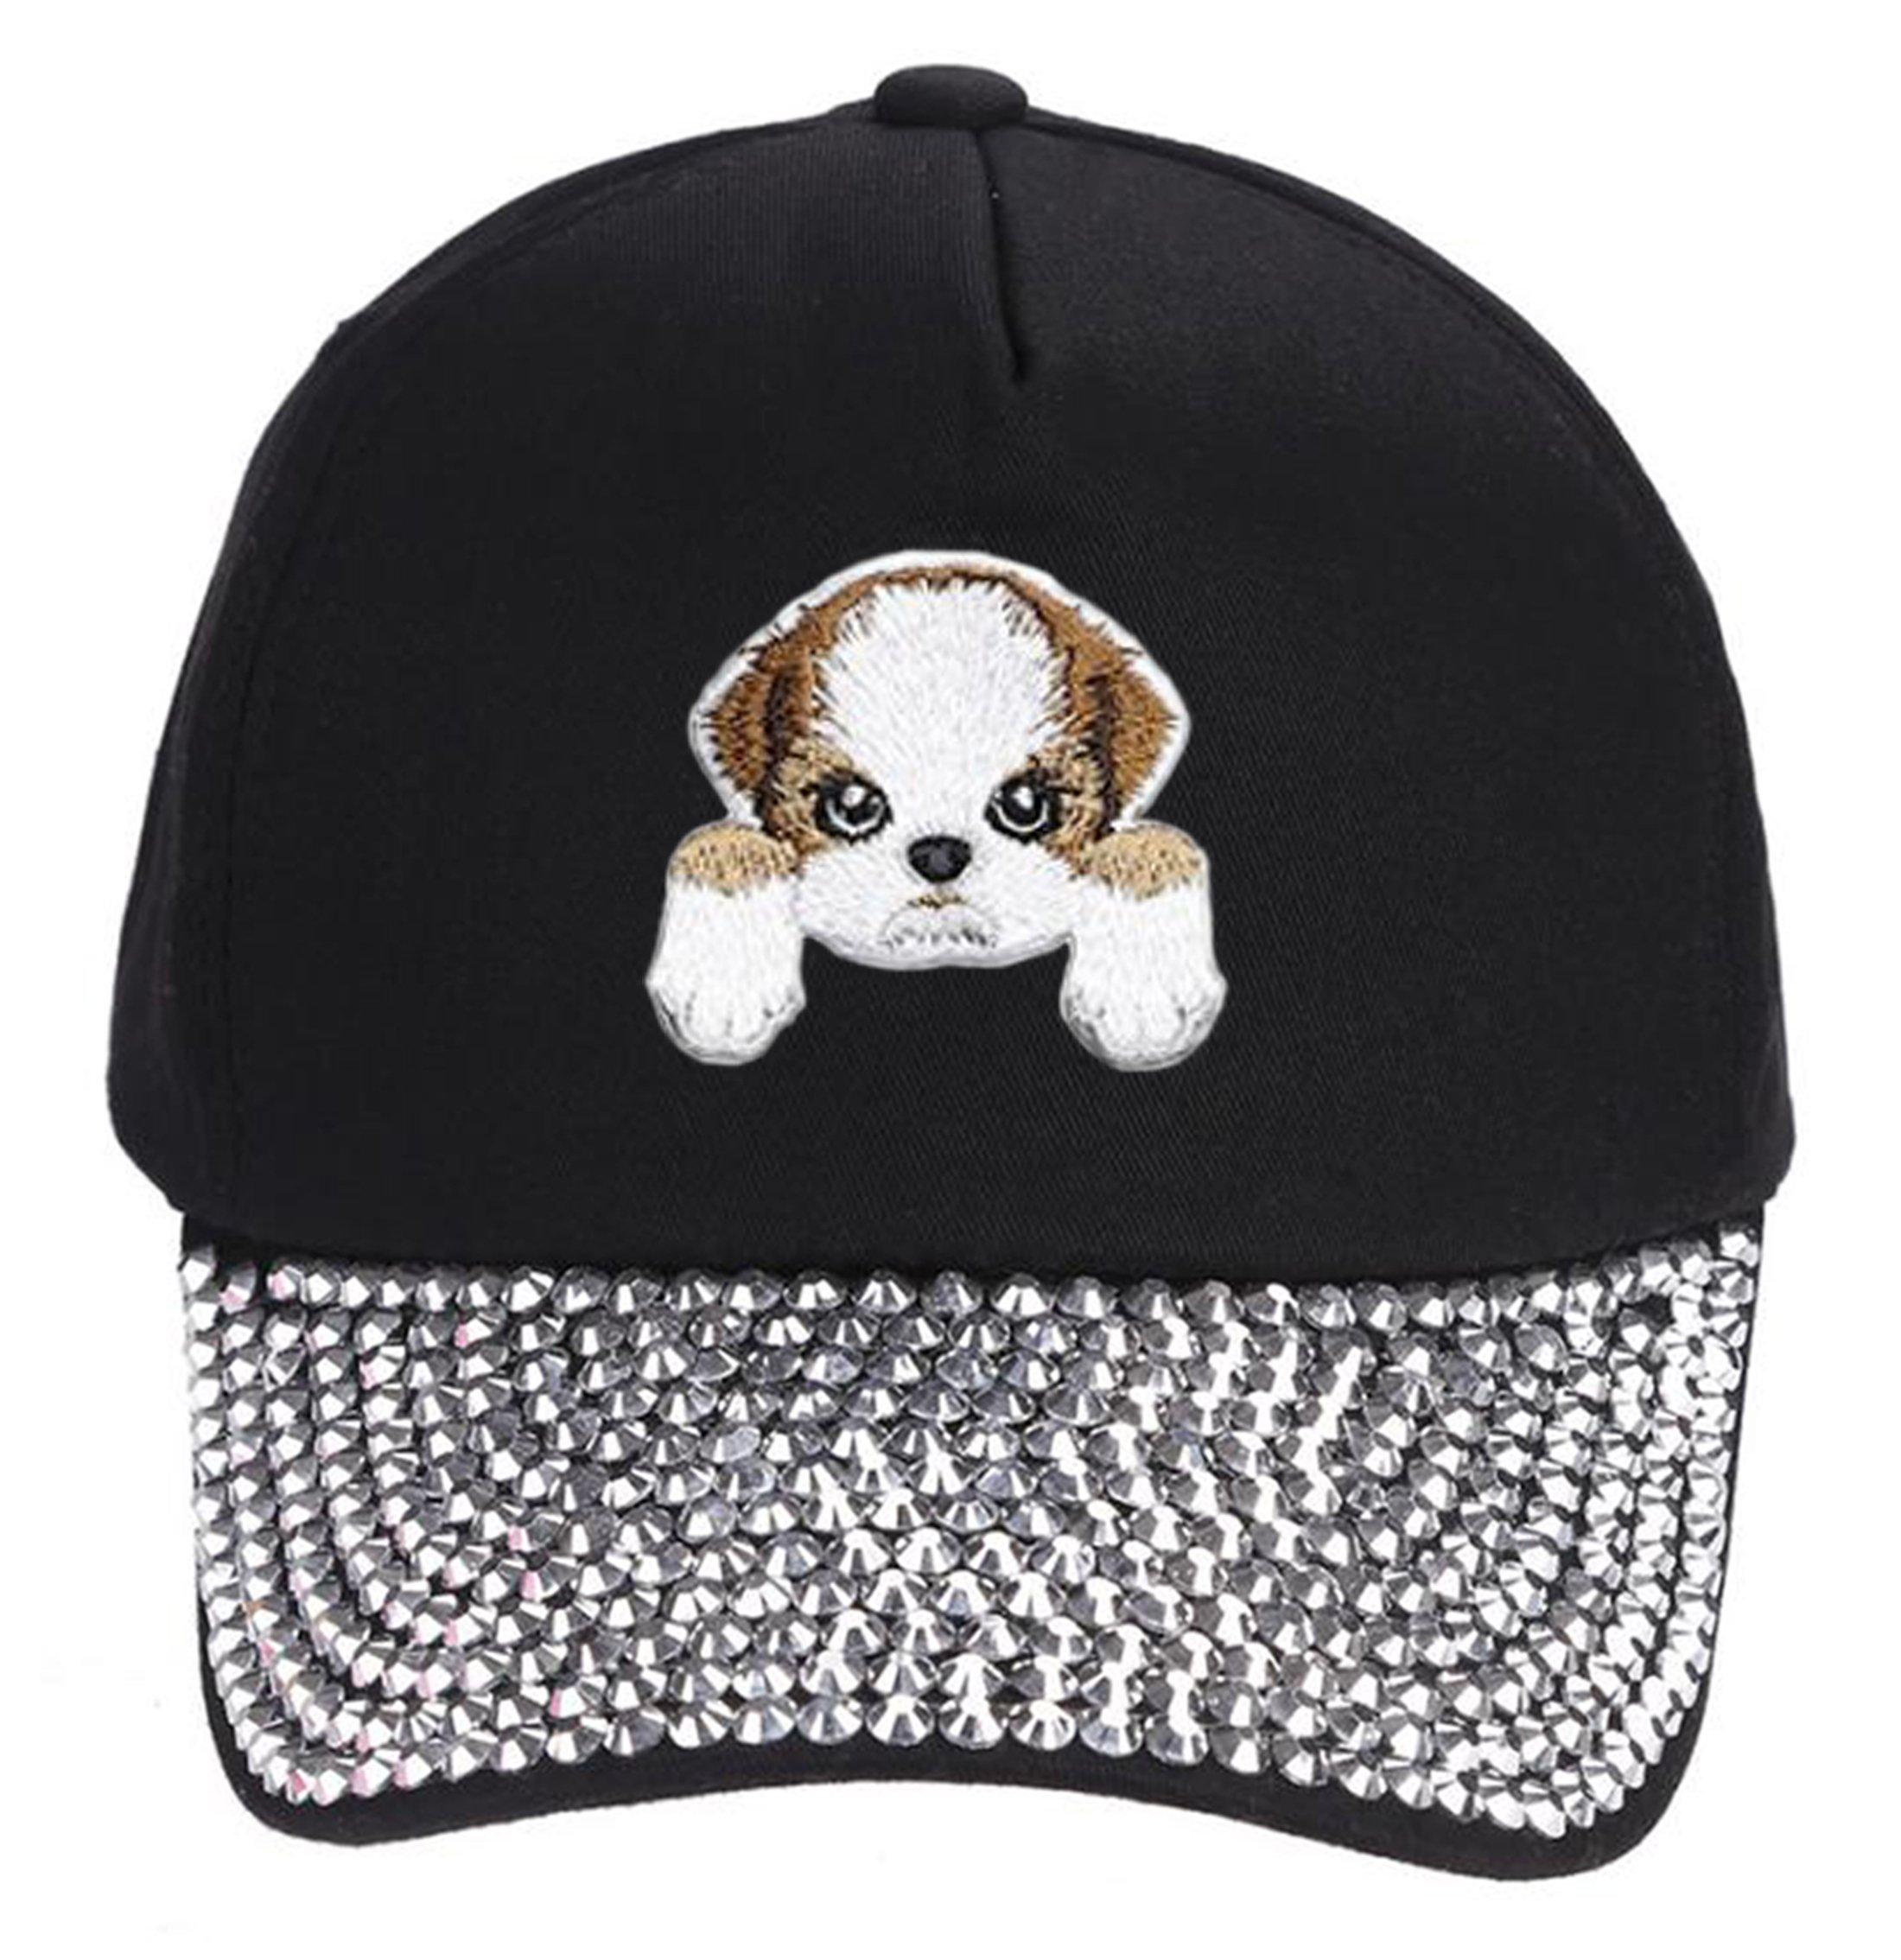 Shih Tzu Dog Hat Cute Puppy Dog Cap (Rhinestone)